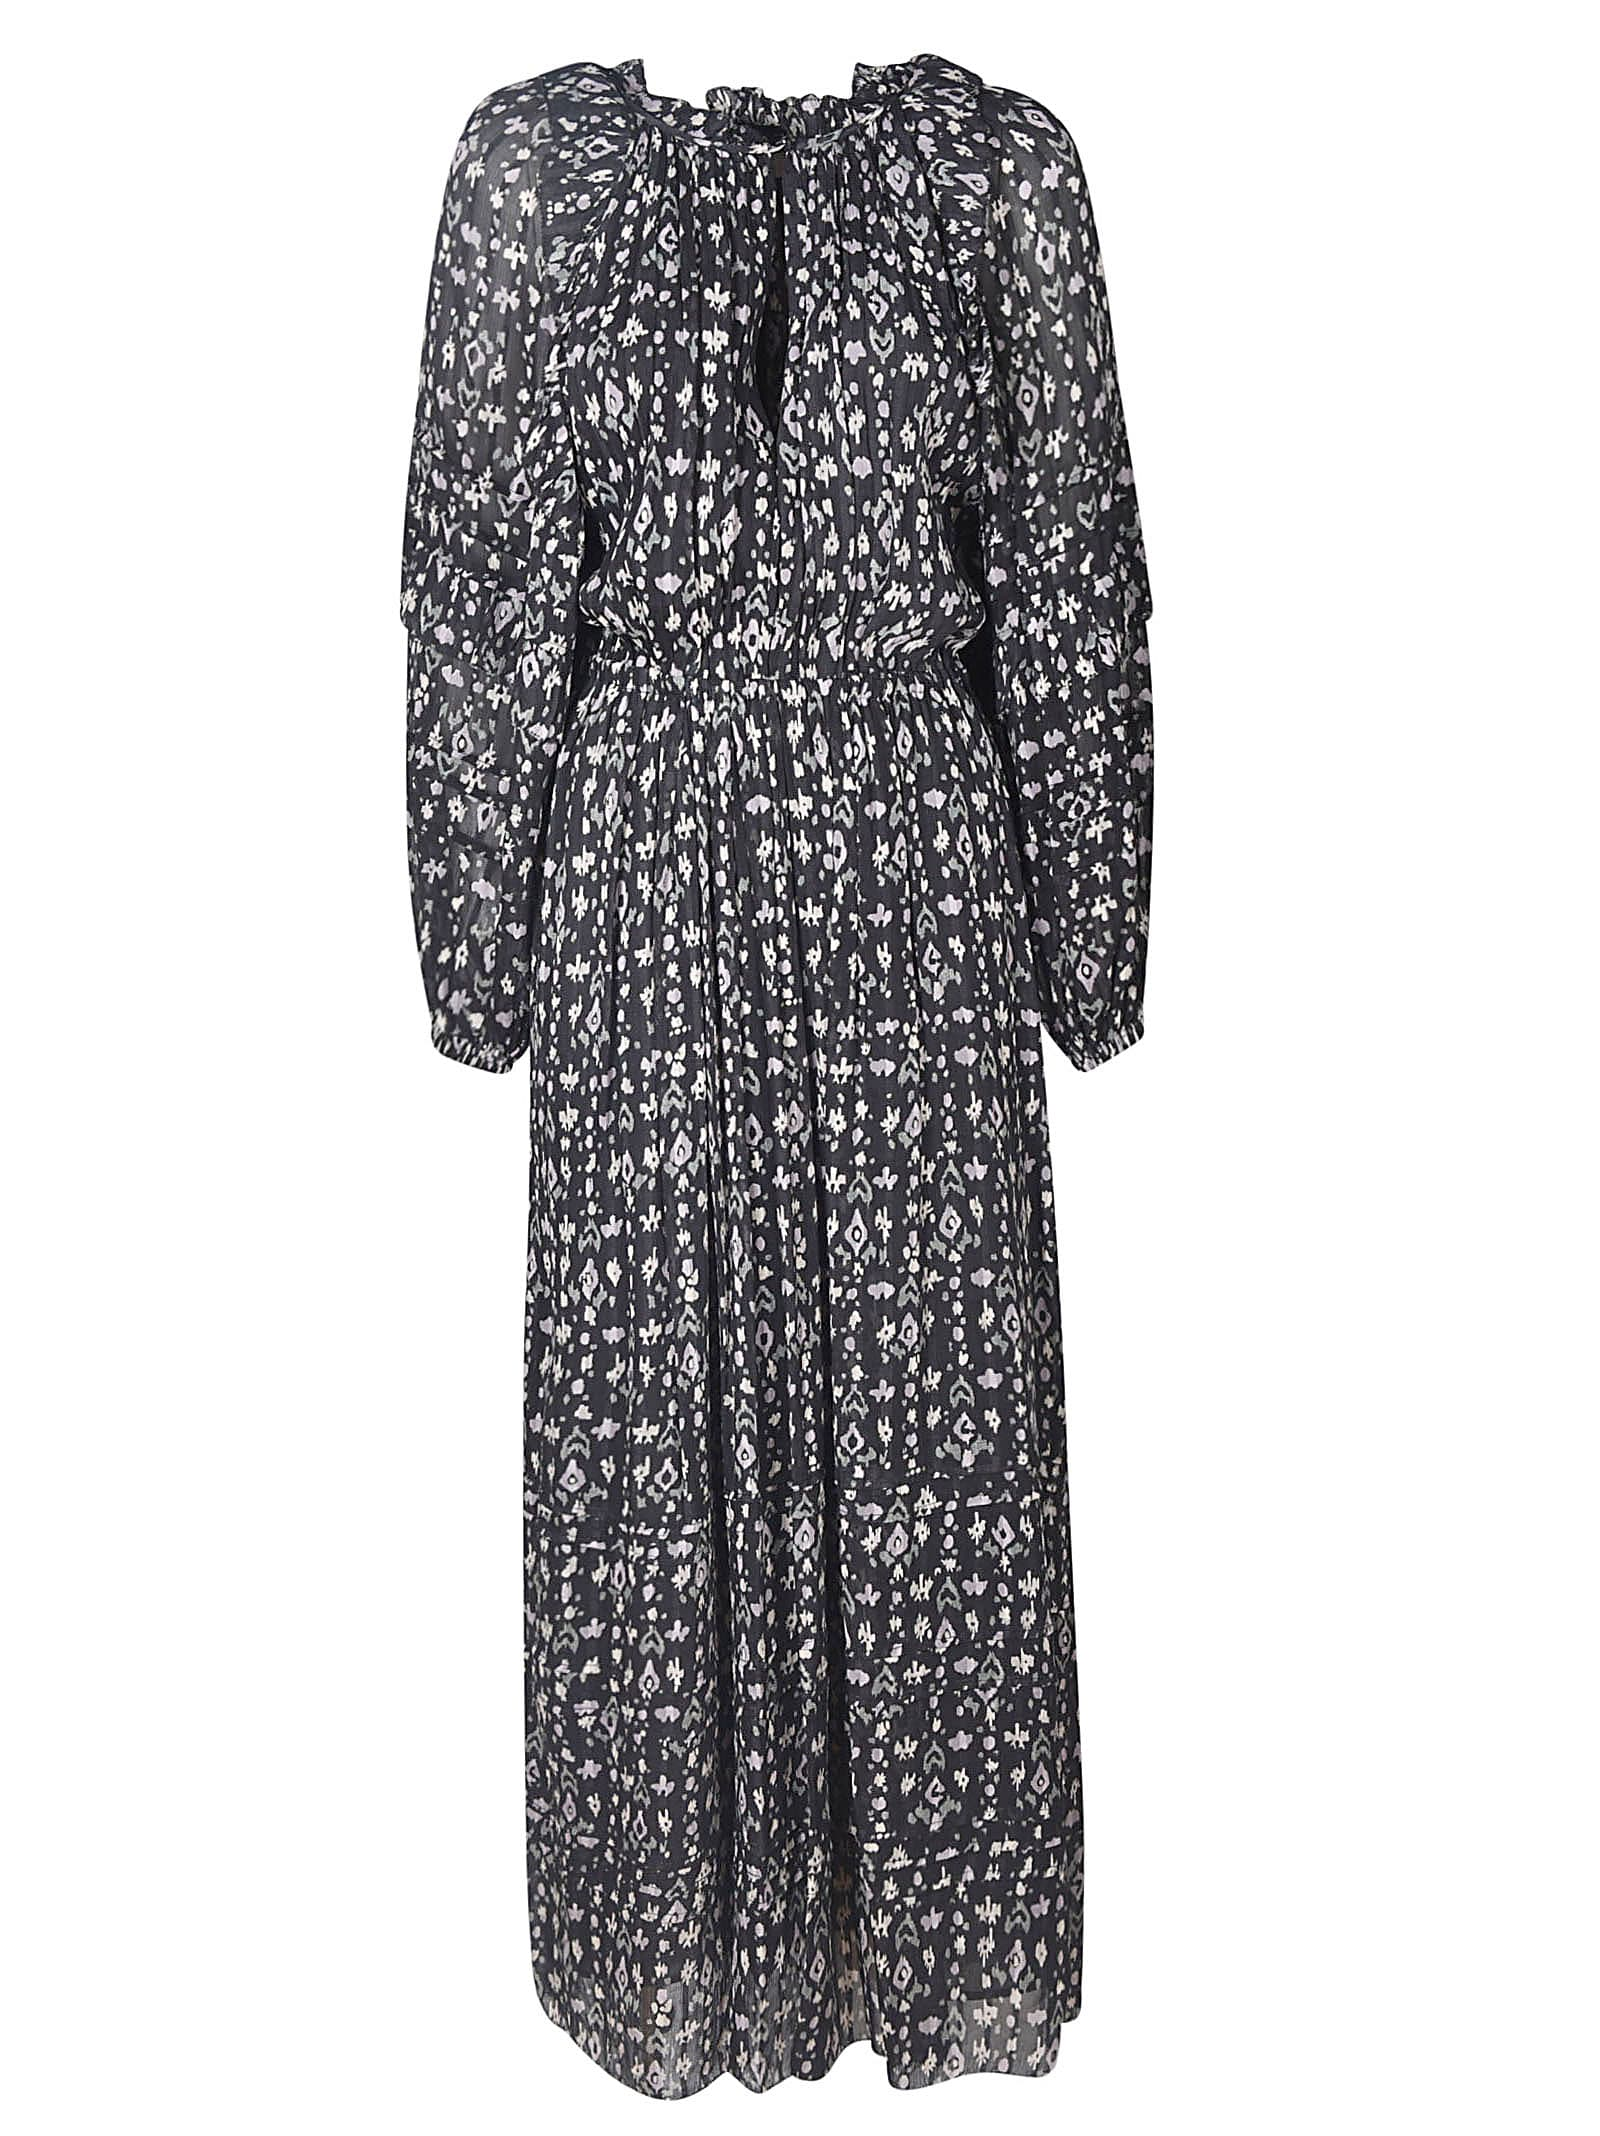 Buy Isabel Marant Étoile Estine Dress online, shop Isabel Marant Étoile with free shipping